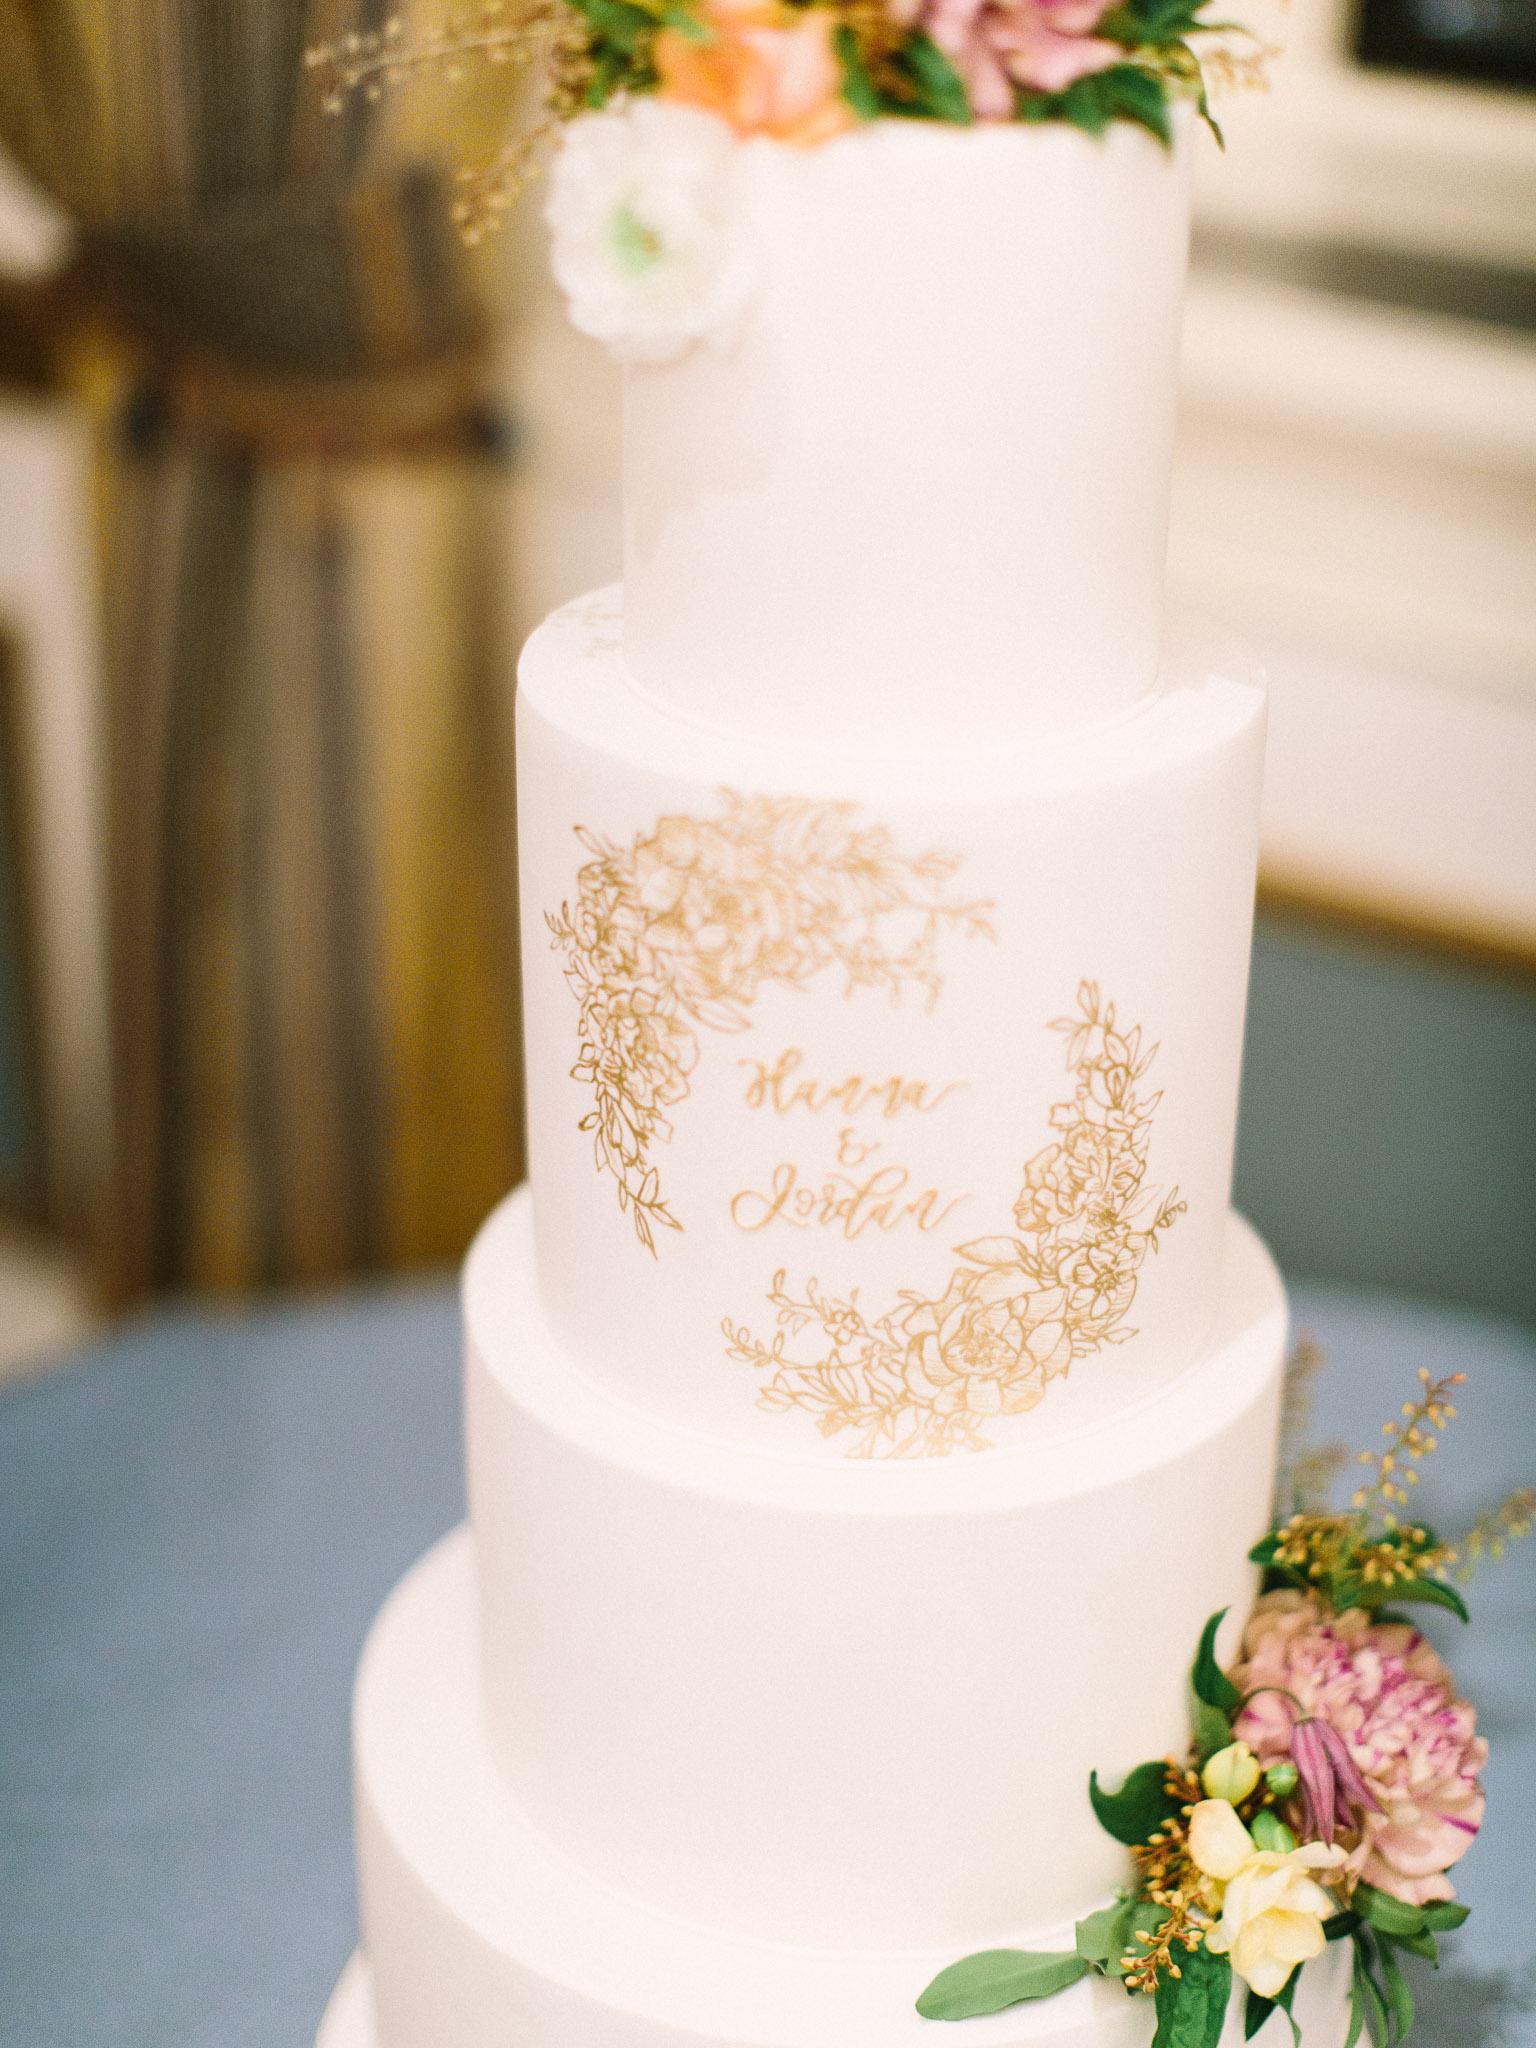 Hanna&Jordan Wedding_HotelVancouver_9465.jpg